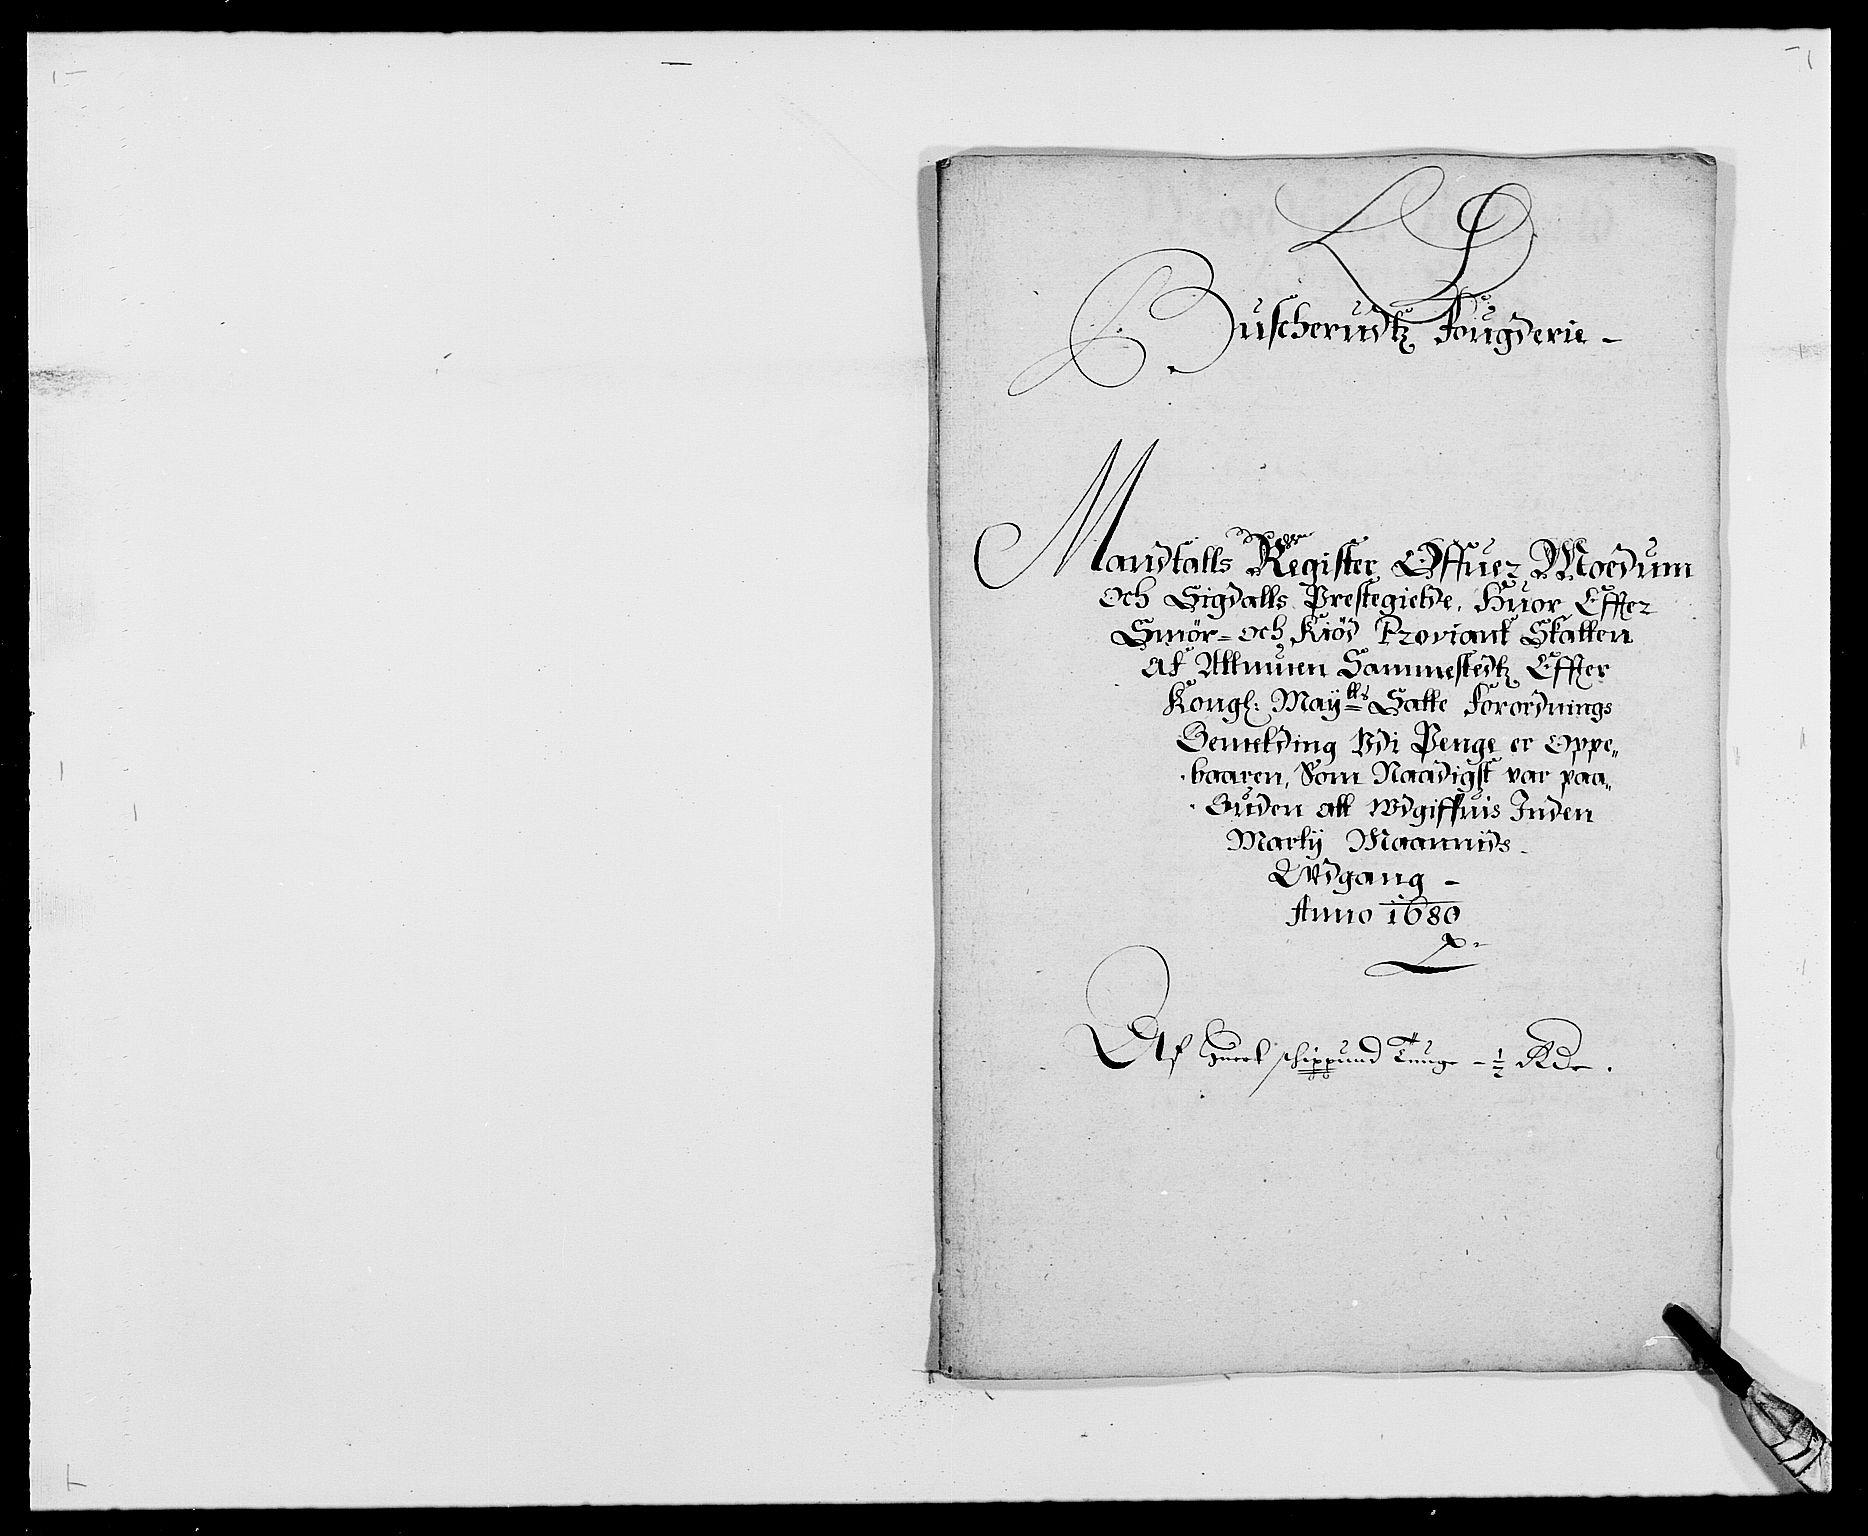 RA, Rentekammeret inntil 1814, Reviderte regnskaper, Fogderegnskap, R25/L1675: Fogderegnskap Buskerud, 1678-1681, s. 106